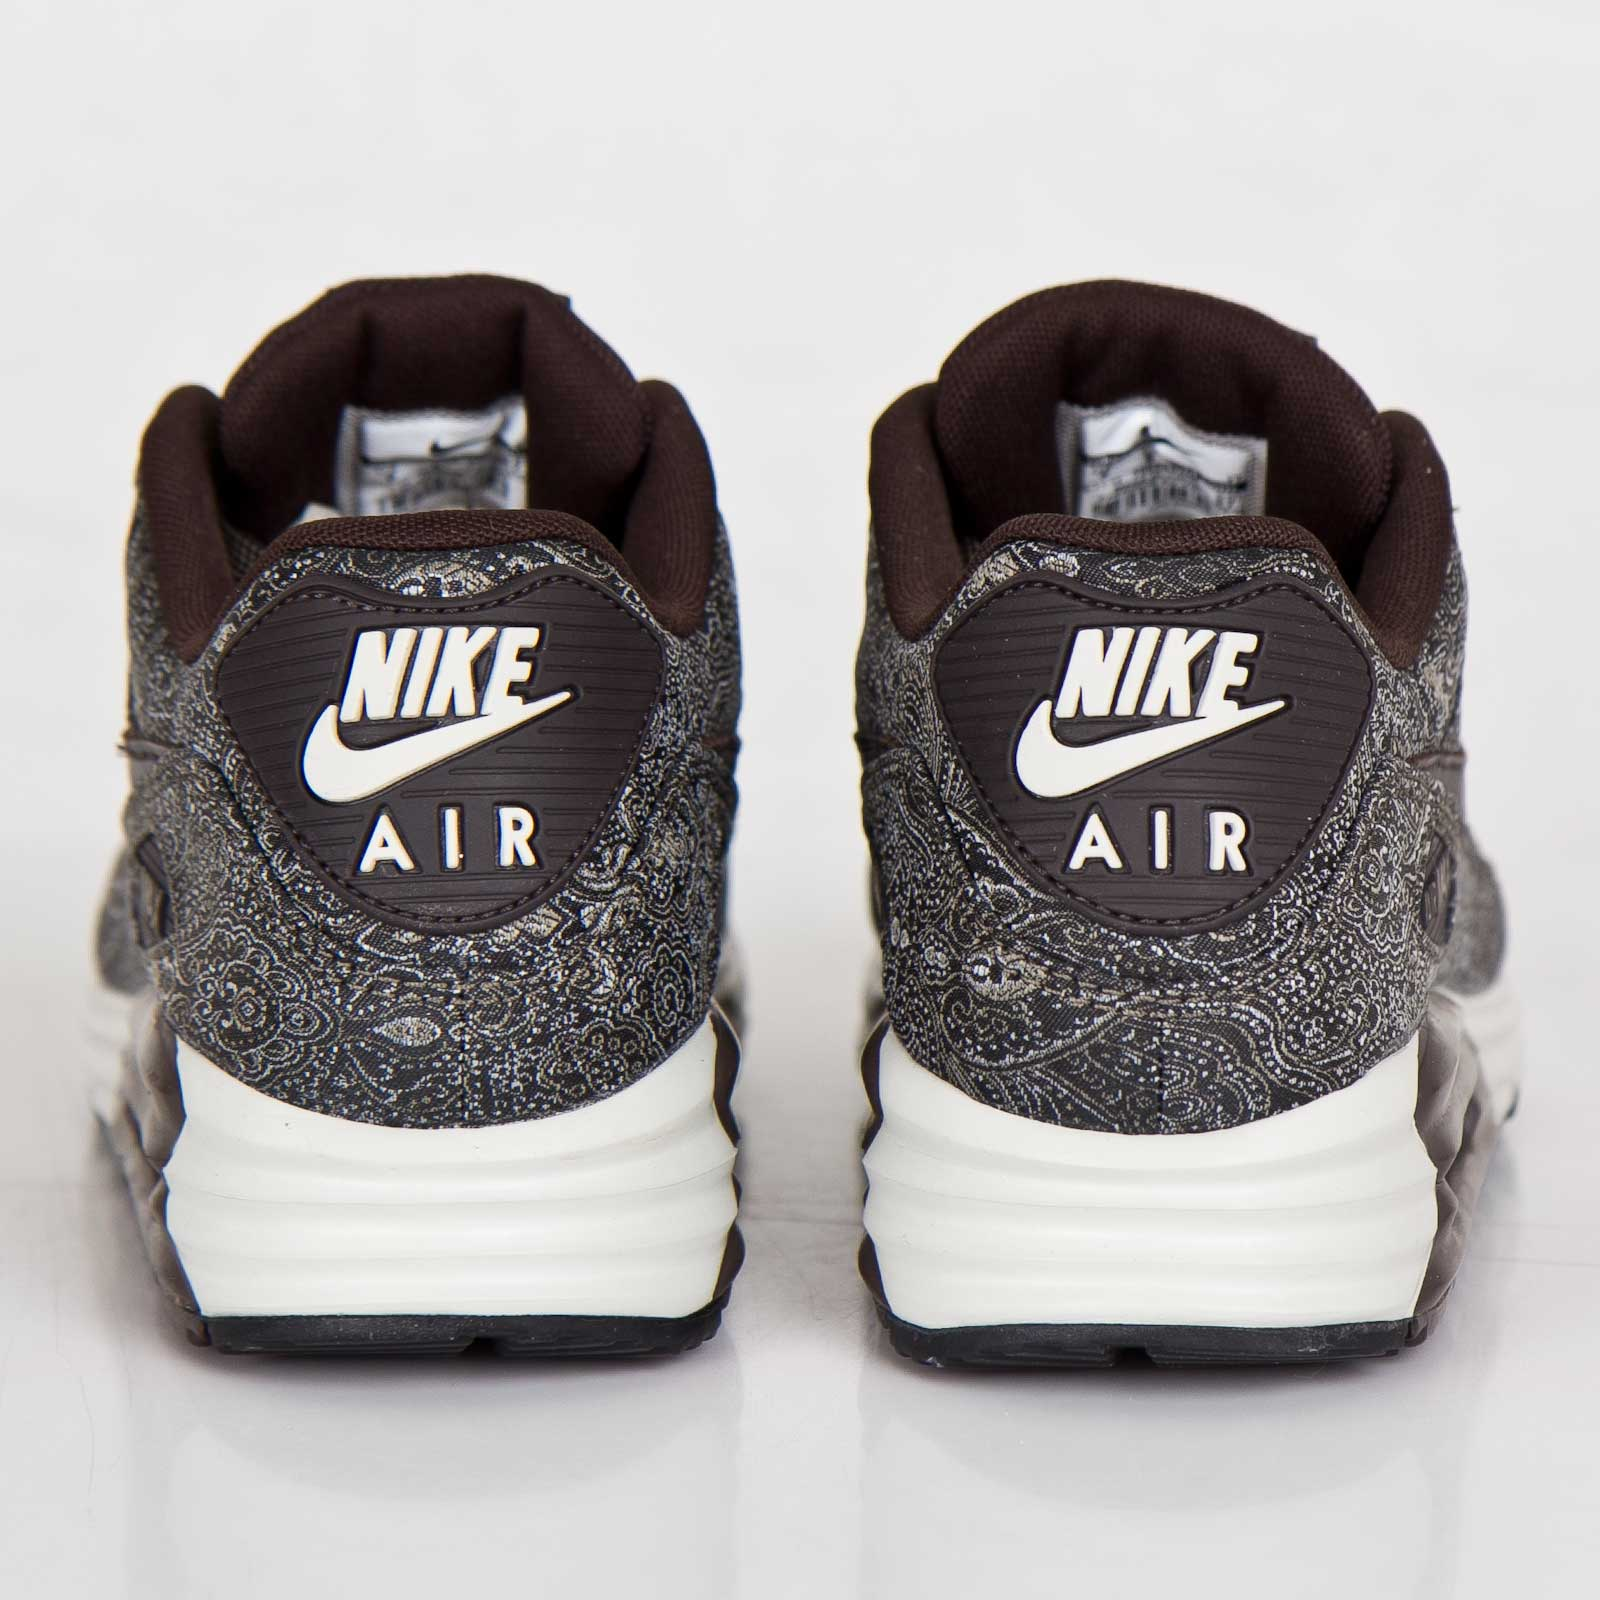 new styles e45ec 6eb0e Nike Air Max Lunar90 Premium QS - 705068-201 - Sneakersnstuff   sneakers    streetwear online since 1999